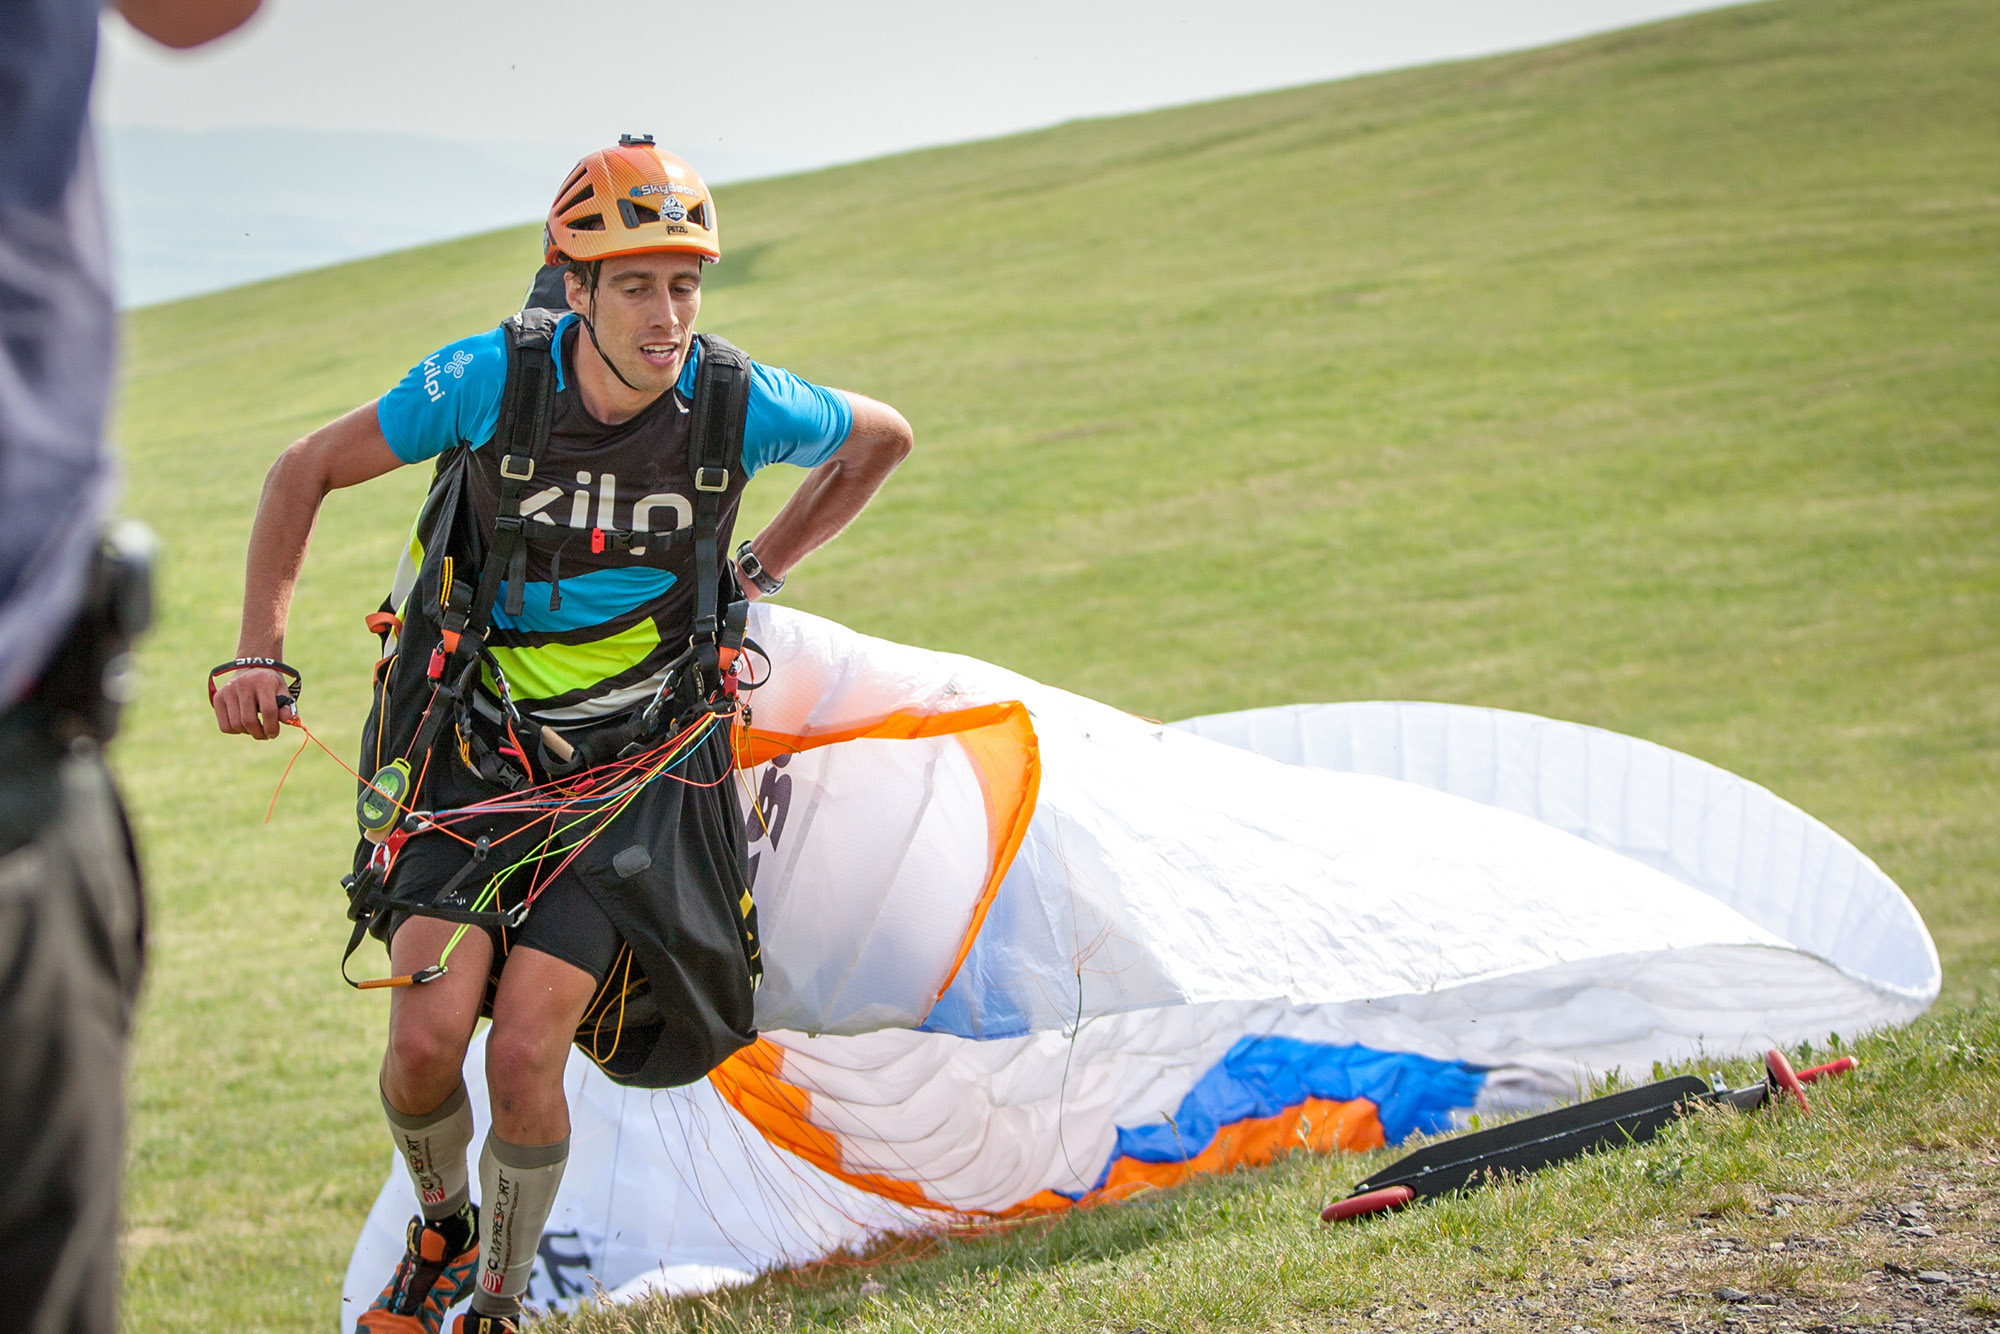 Czech One Day Hike & Fly 2018 - Kilpi